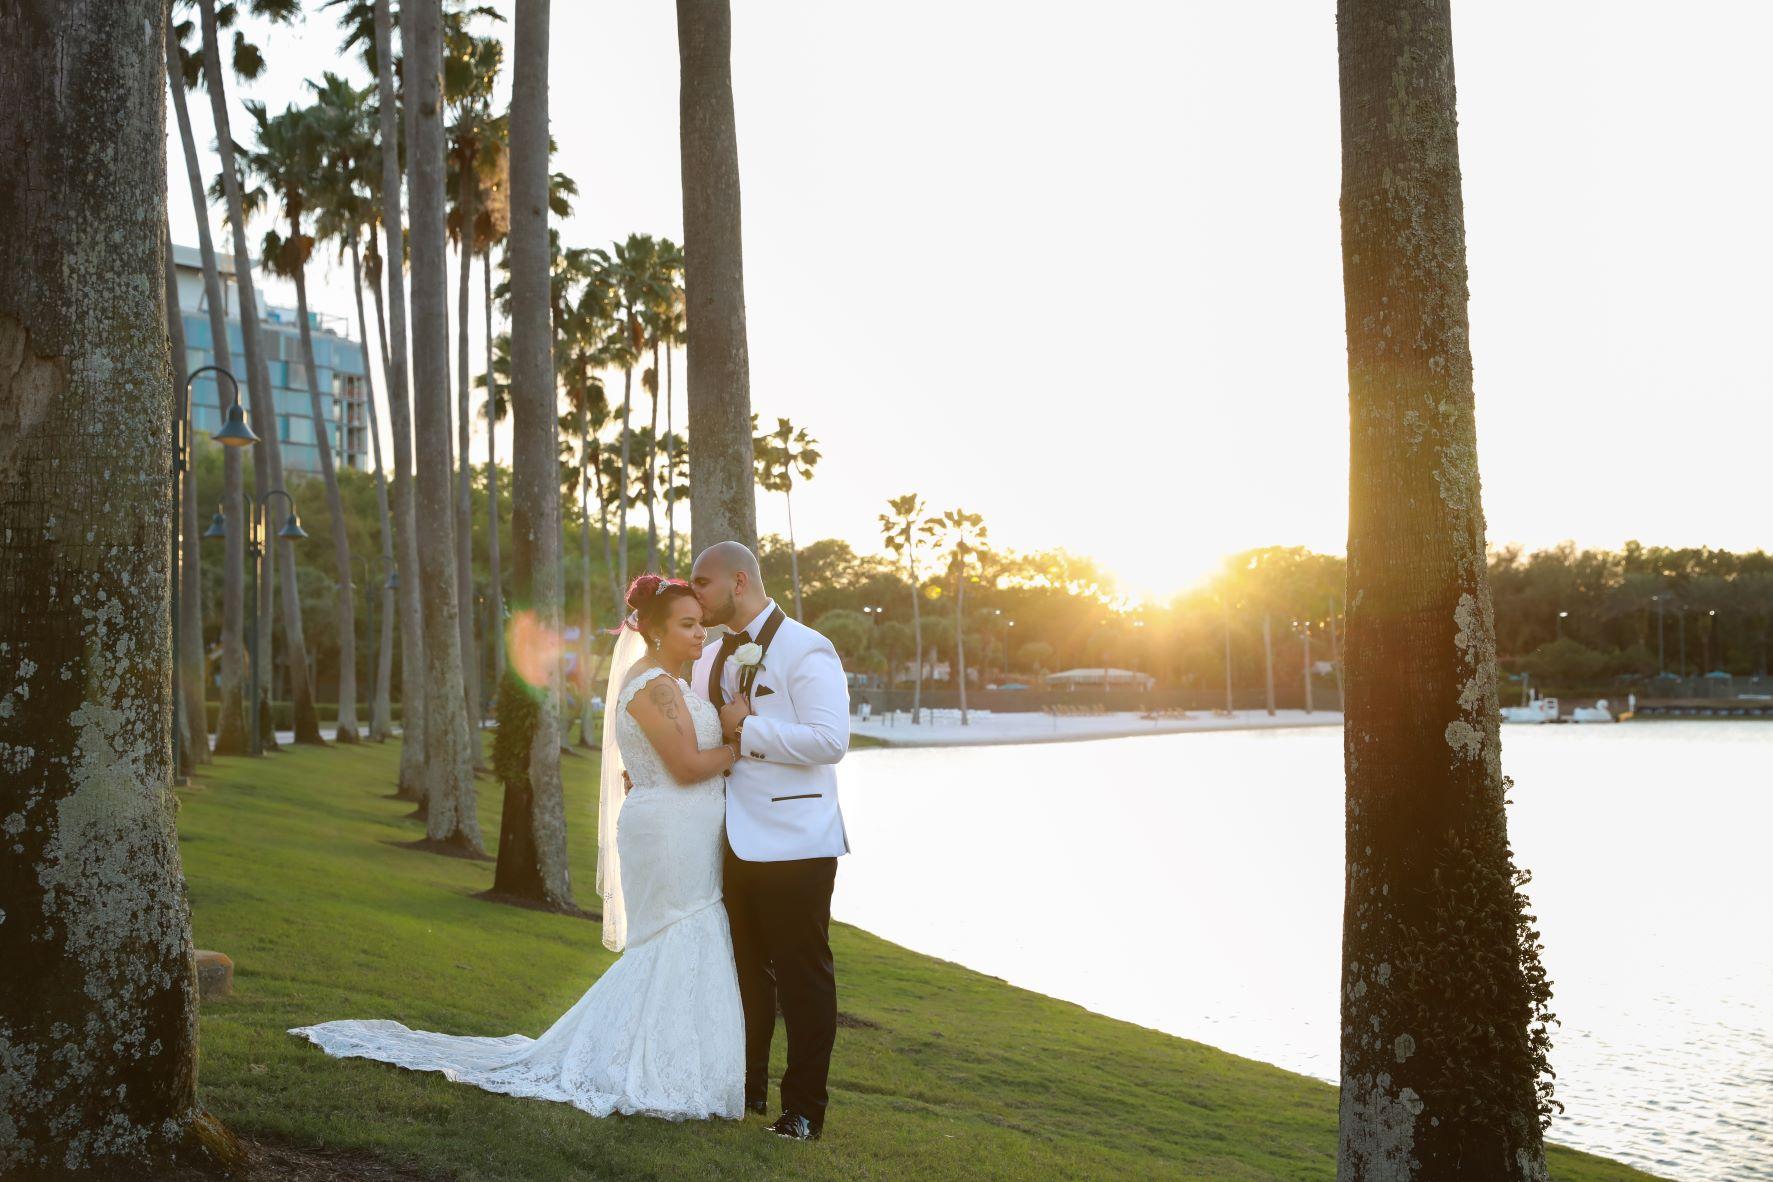 The March Swan Wedding of Sabrina and Geraldo